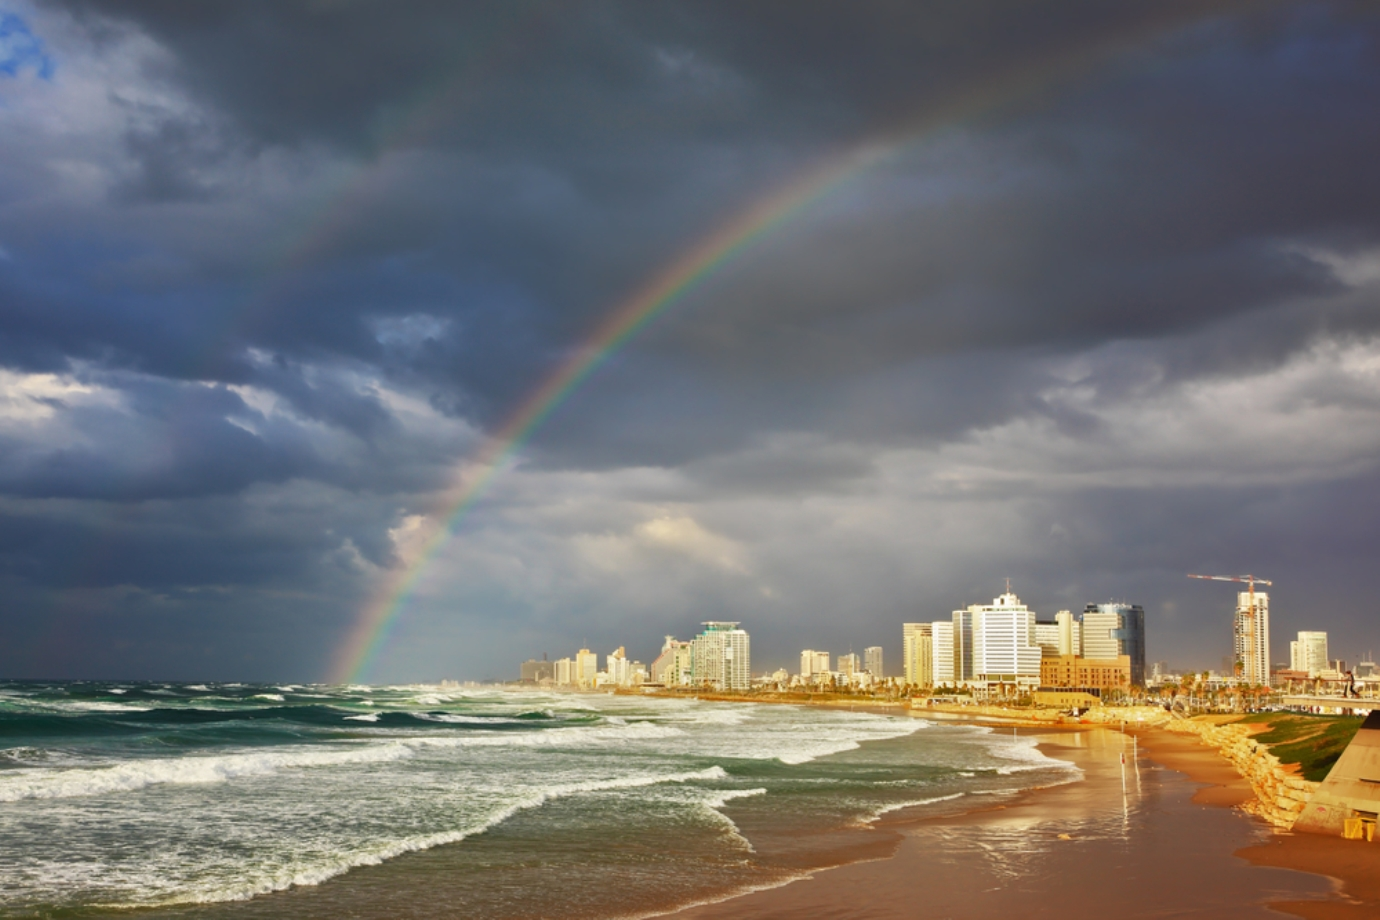 A rainbow lights up the promenade in Tel Aviv. Photo via Shutterstock.com